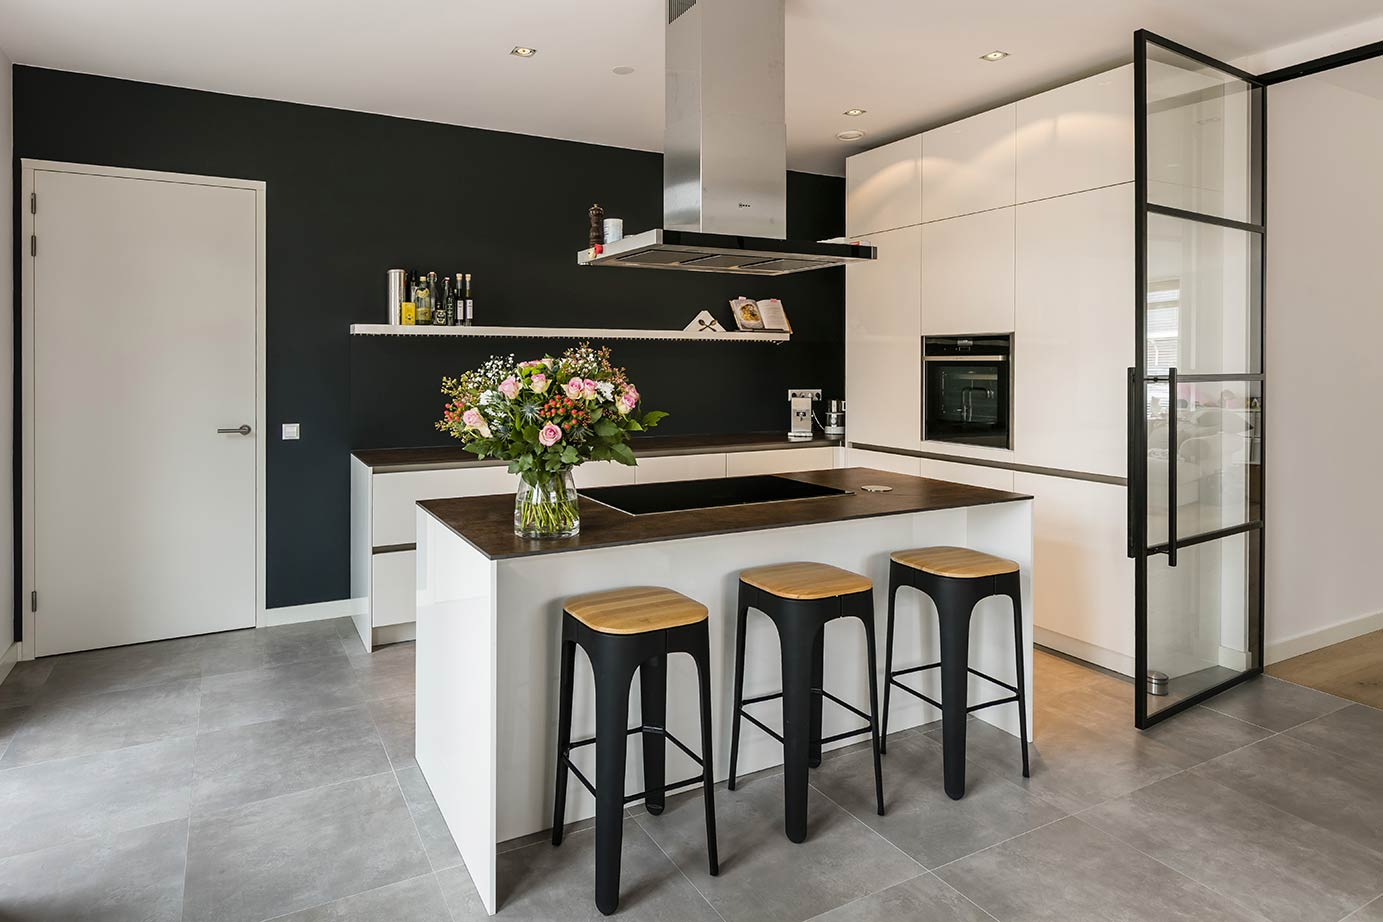 Ardi Keukens Ervaringen : Ardi keukens en sanitair dé keukenspecialist van zeeland ardi